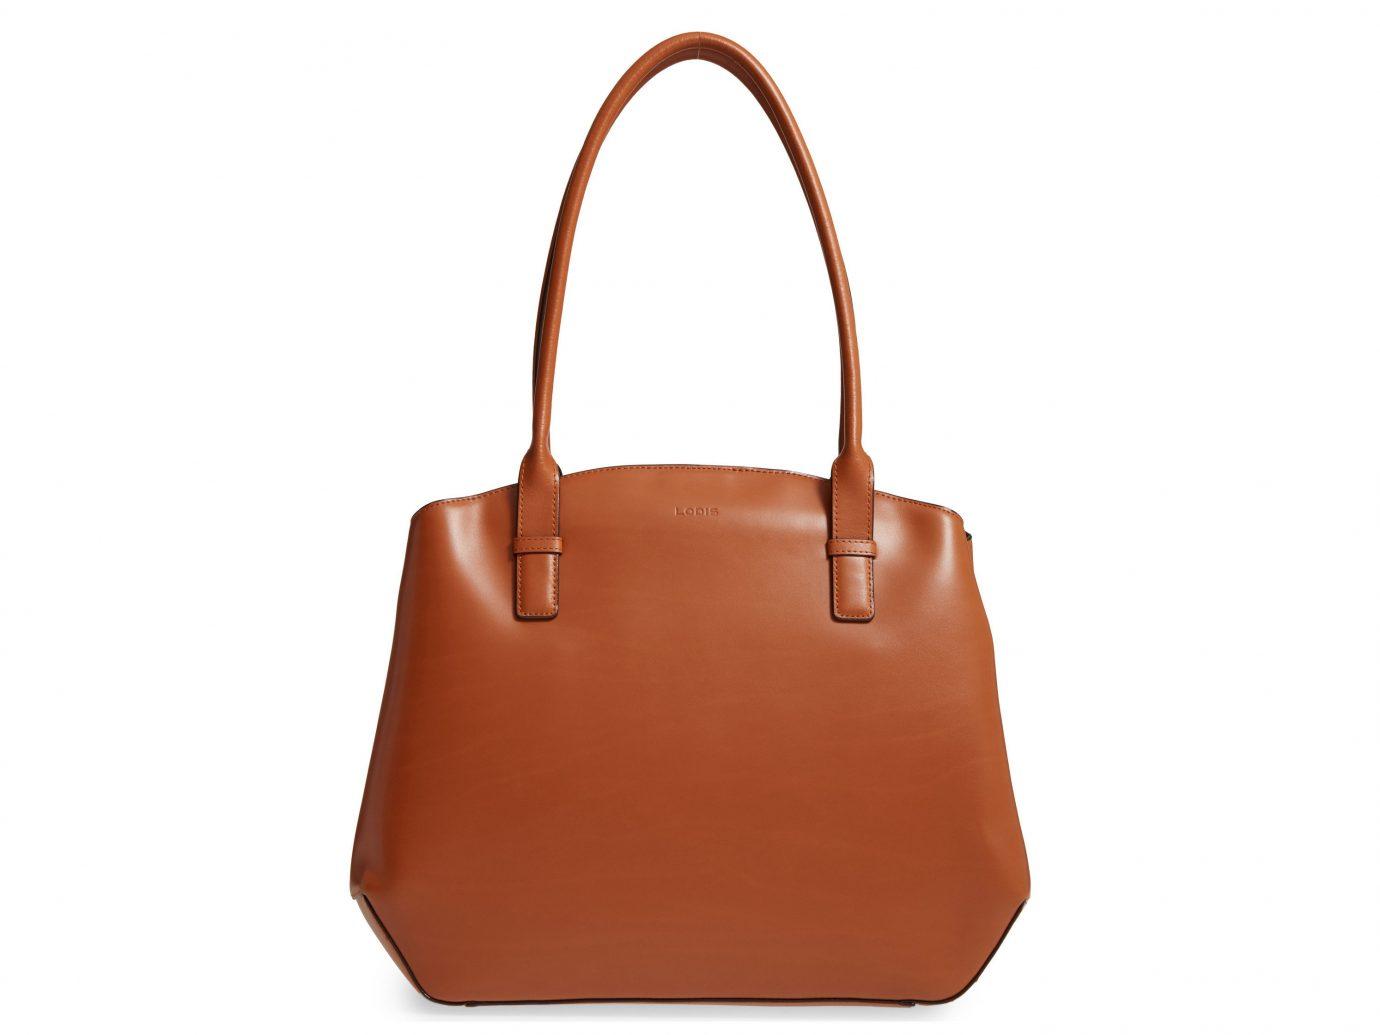 Packing Tips Style + Design Travel Shop Weekend Getaways bag handbag orange brown shoulder bag leather fashion accessory accessory caramel color product peach product design tote bag beige brand strap